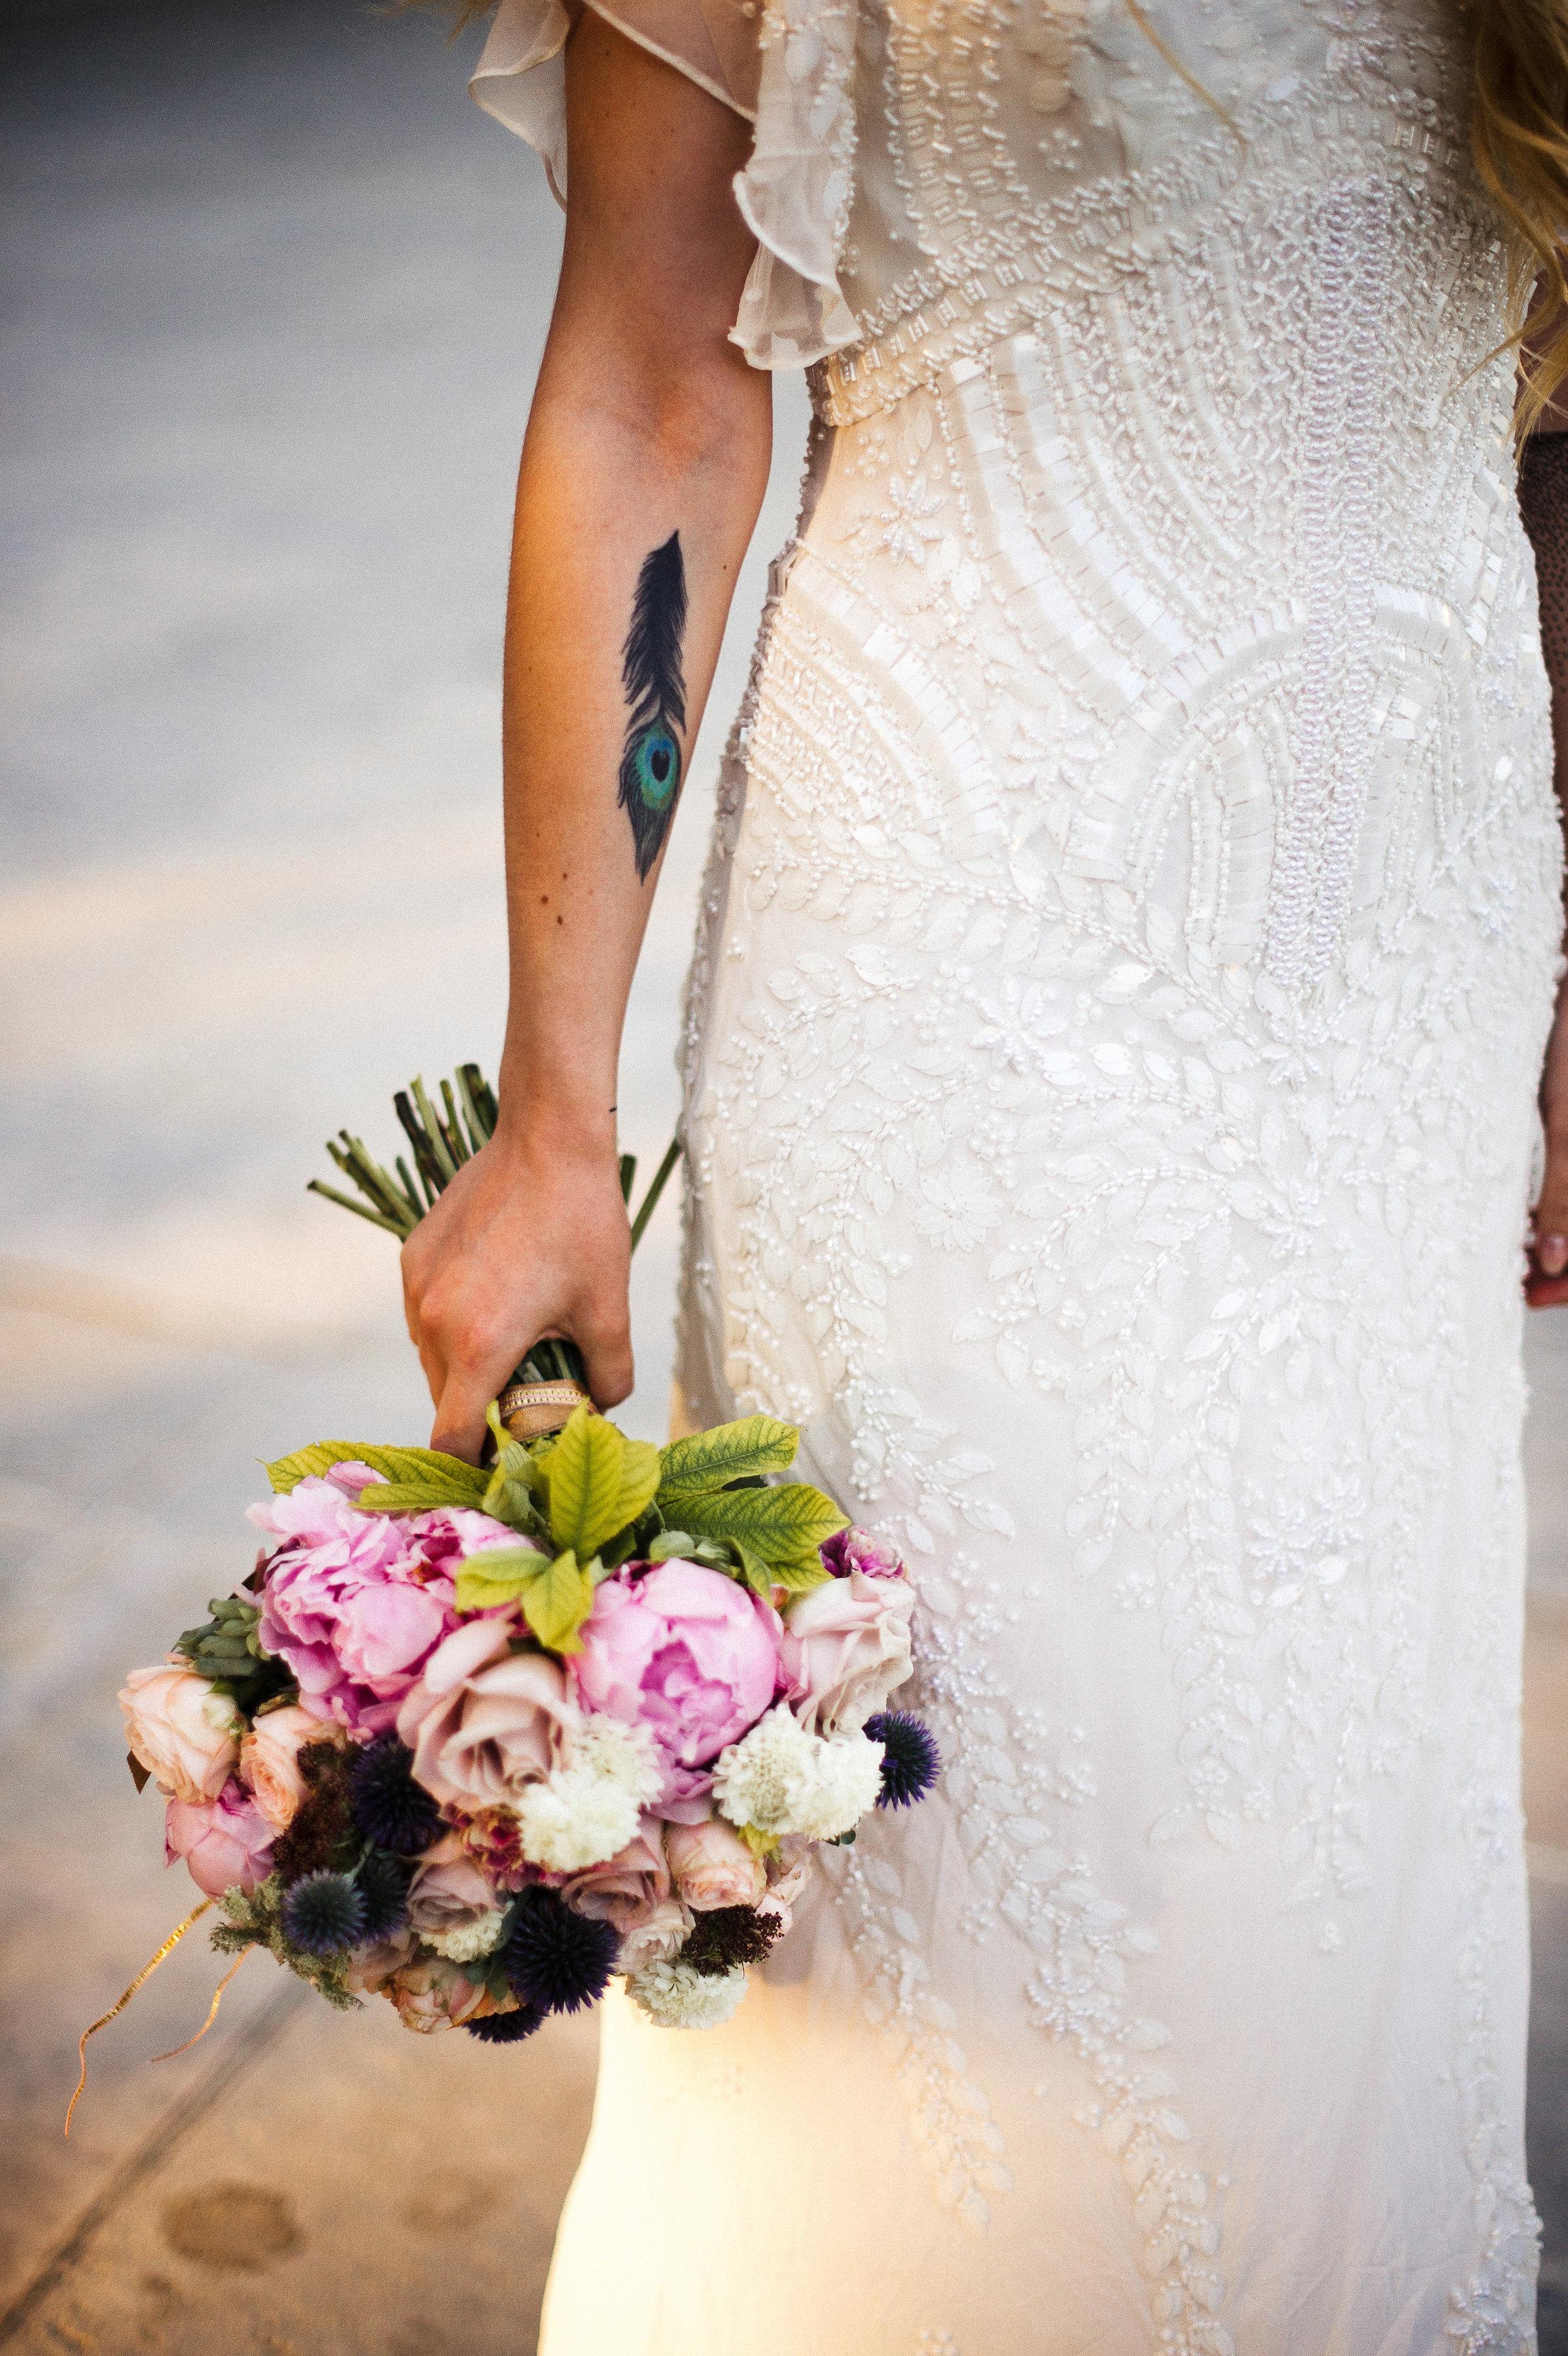 bouquet-mariee-moderne-rose-blanc-menthe-sauvage-fleuriste-mariage-lyon-the-great-palette-2(83)